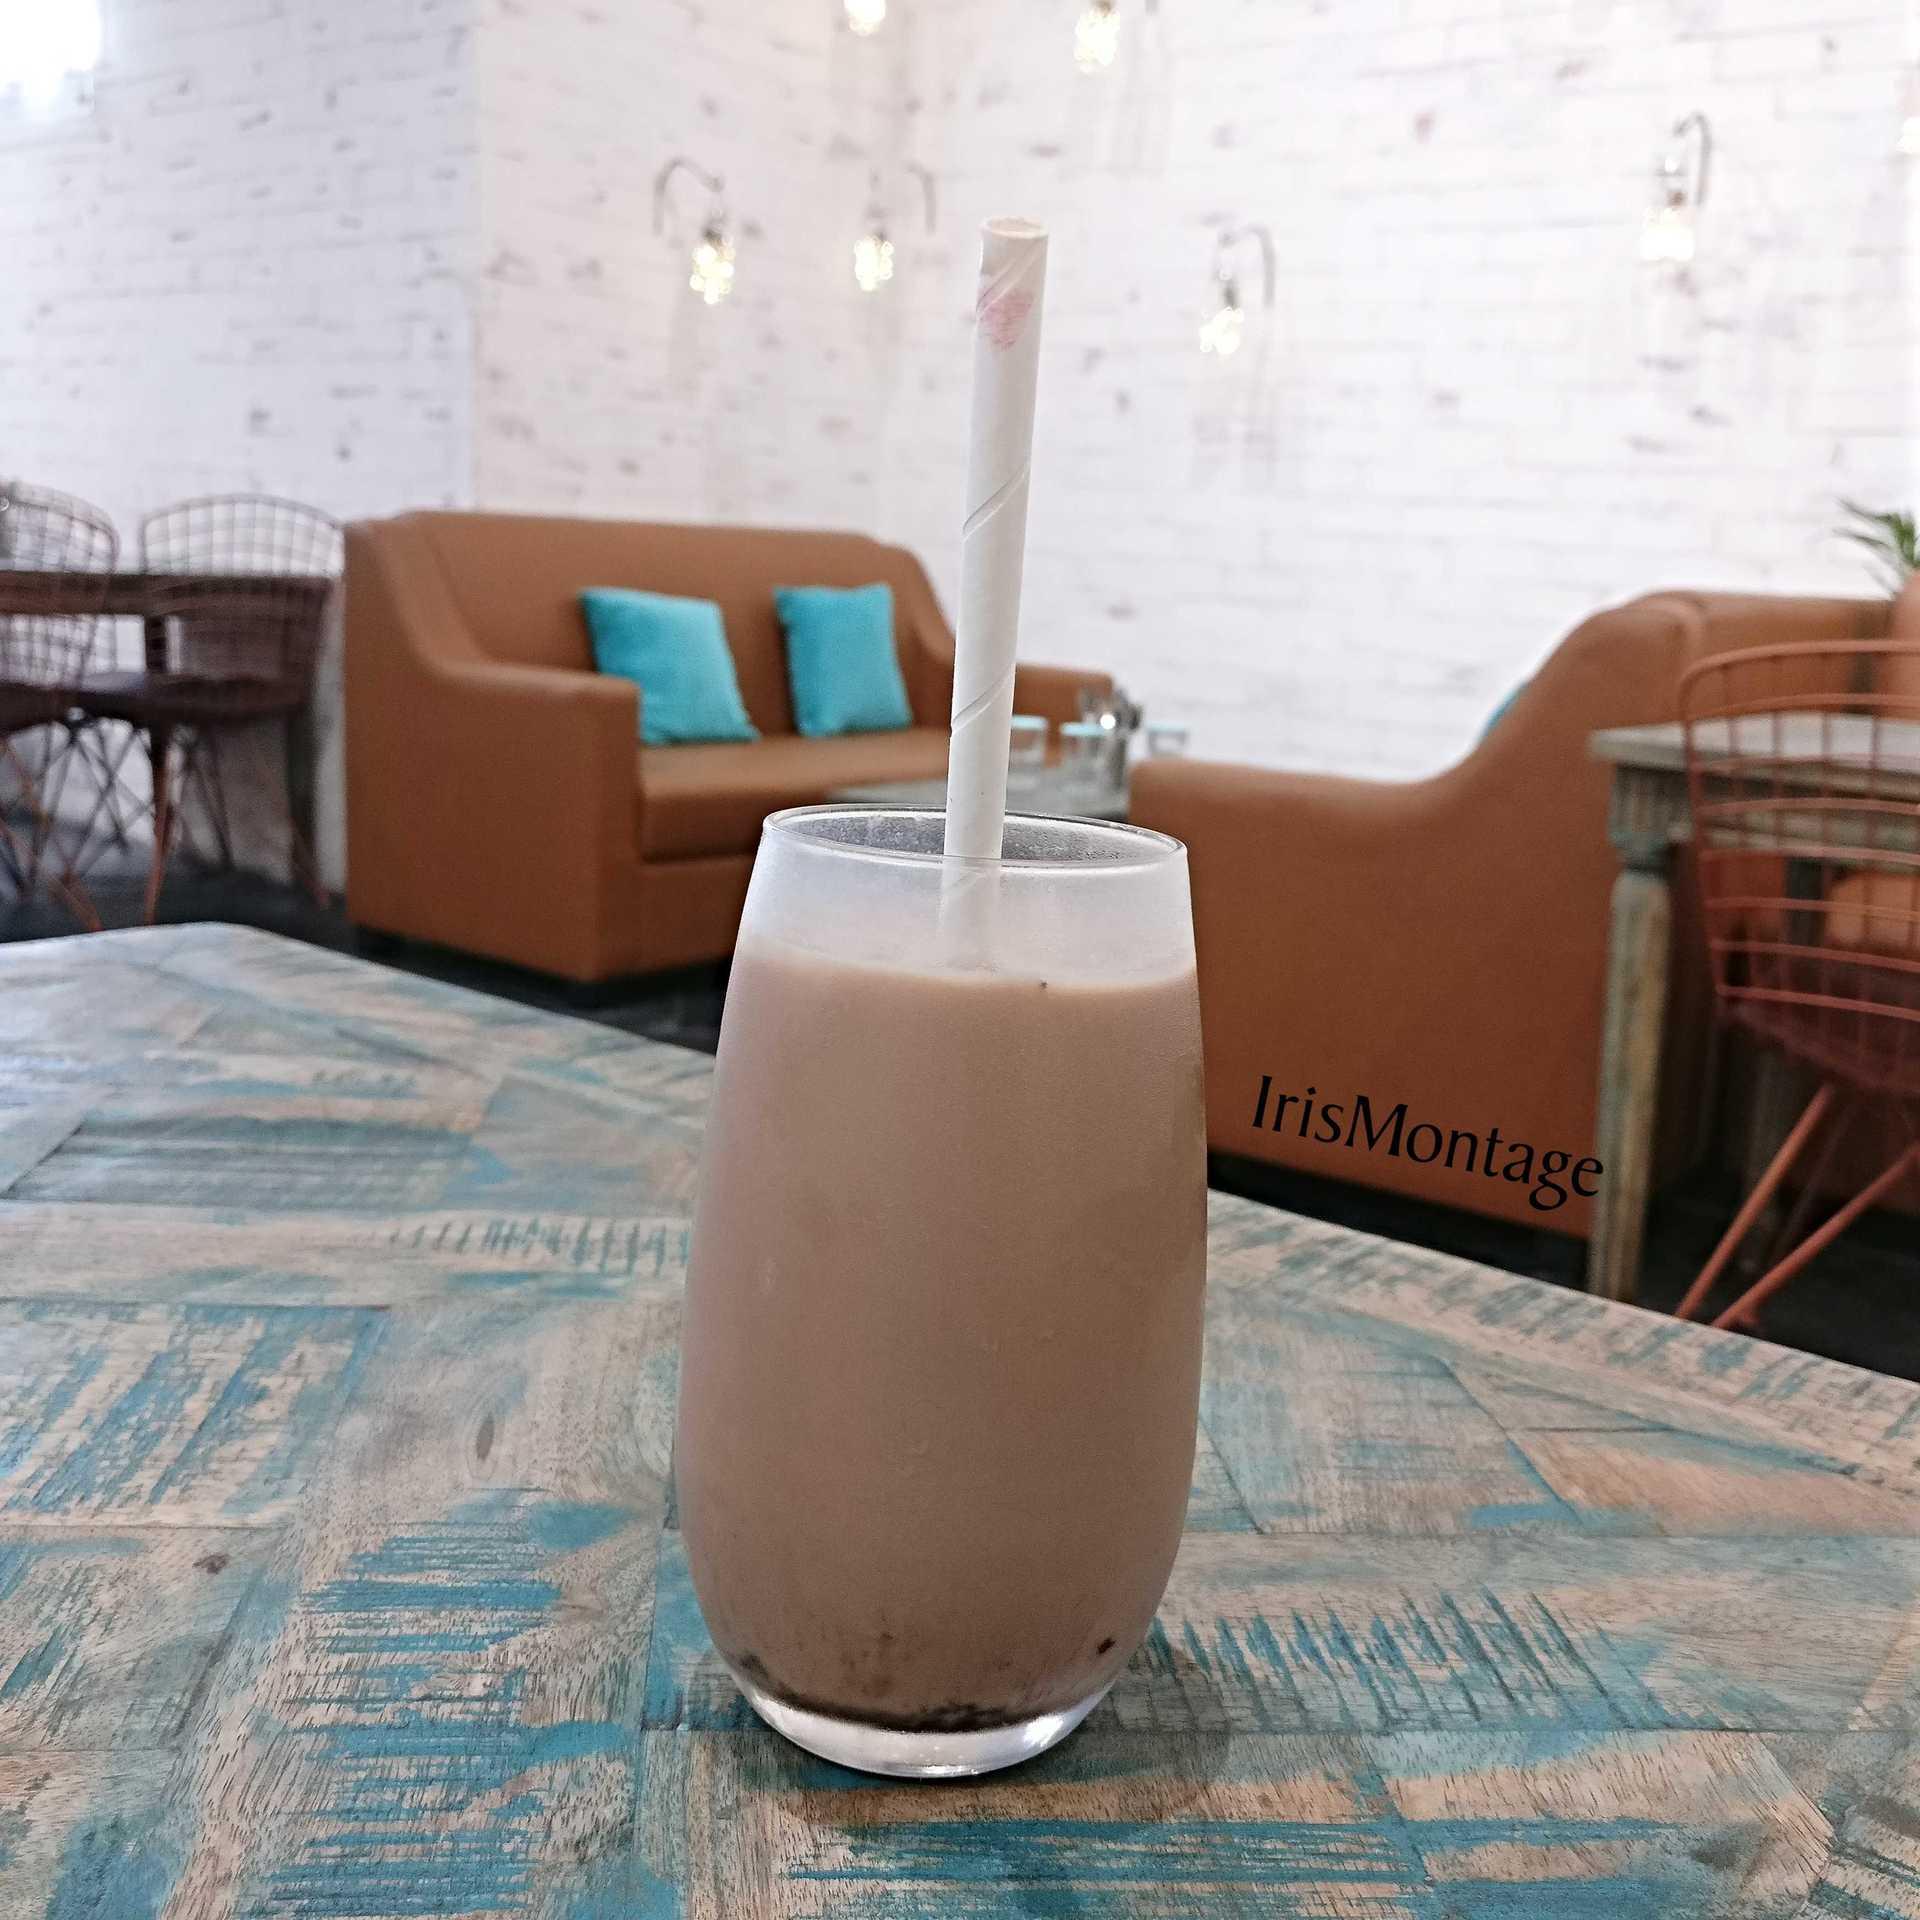 IrisMontage - resto cafe in chennai patissez